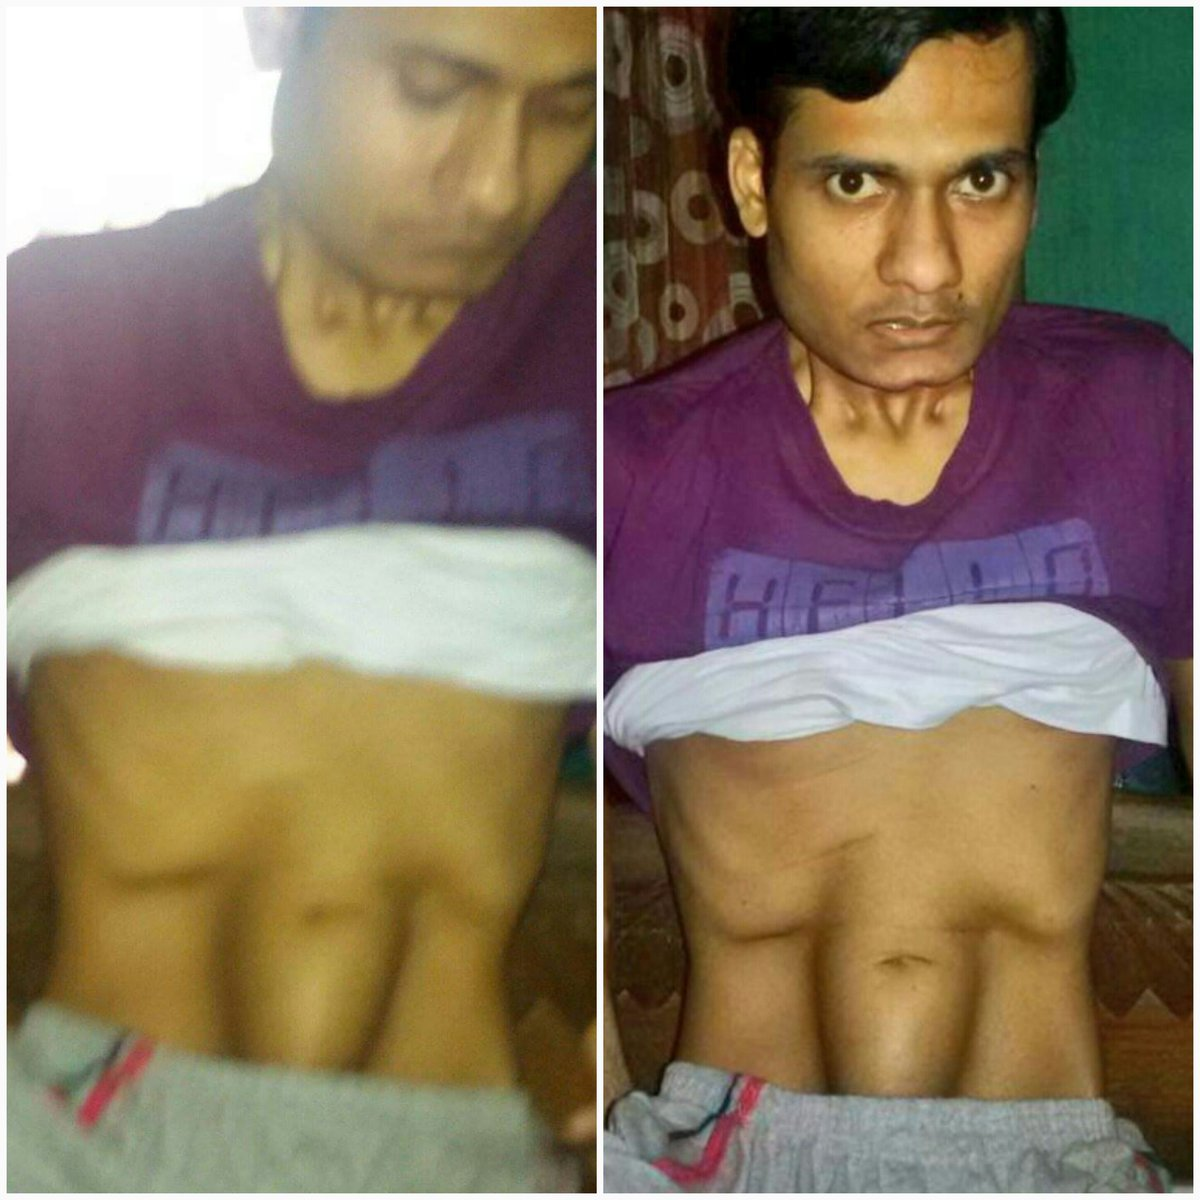 @DharaOils I promise  Eat healthy stay wealthy, and doing yoga asana Daily  #ImmunityHarDin  #ContestAlert #Contest #DharaOils @DharaOils   @guptashubhamece @Rimaaroraa @reenag00091 @yashgandhi66 @Cheeni37273638 @HappyParesh_MI  @ThagriaHema @SrinathAkula369 @ImChandana01 @rk_theshowman https://t.co/0NR5dtCnHD